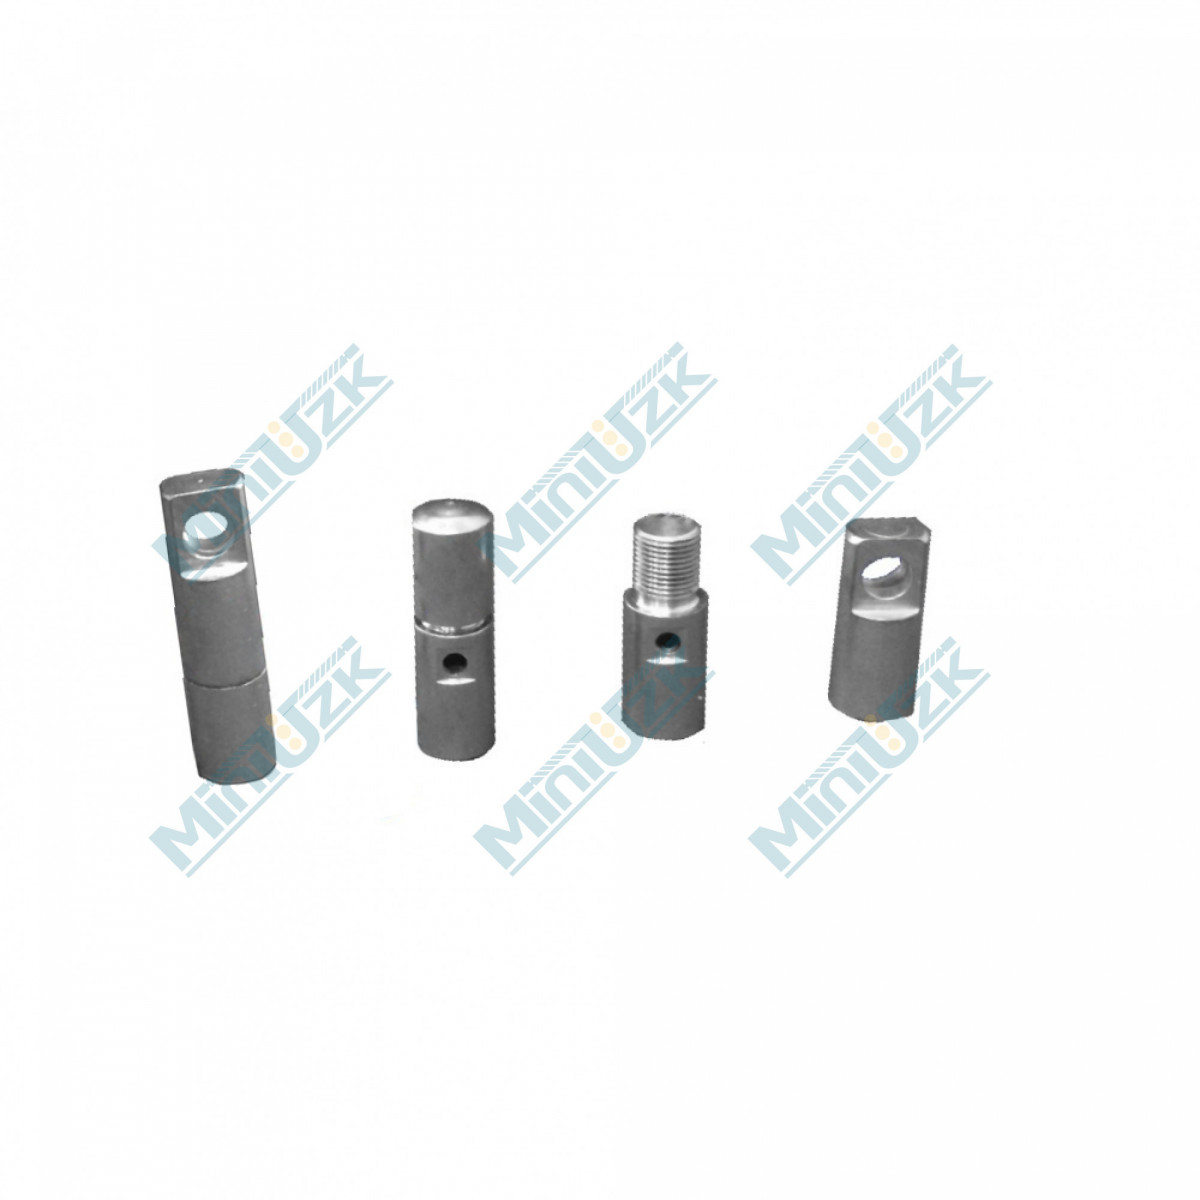 Устройство закладки кабеля (УЗК) OlmiOn СП-Т1-9/300